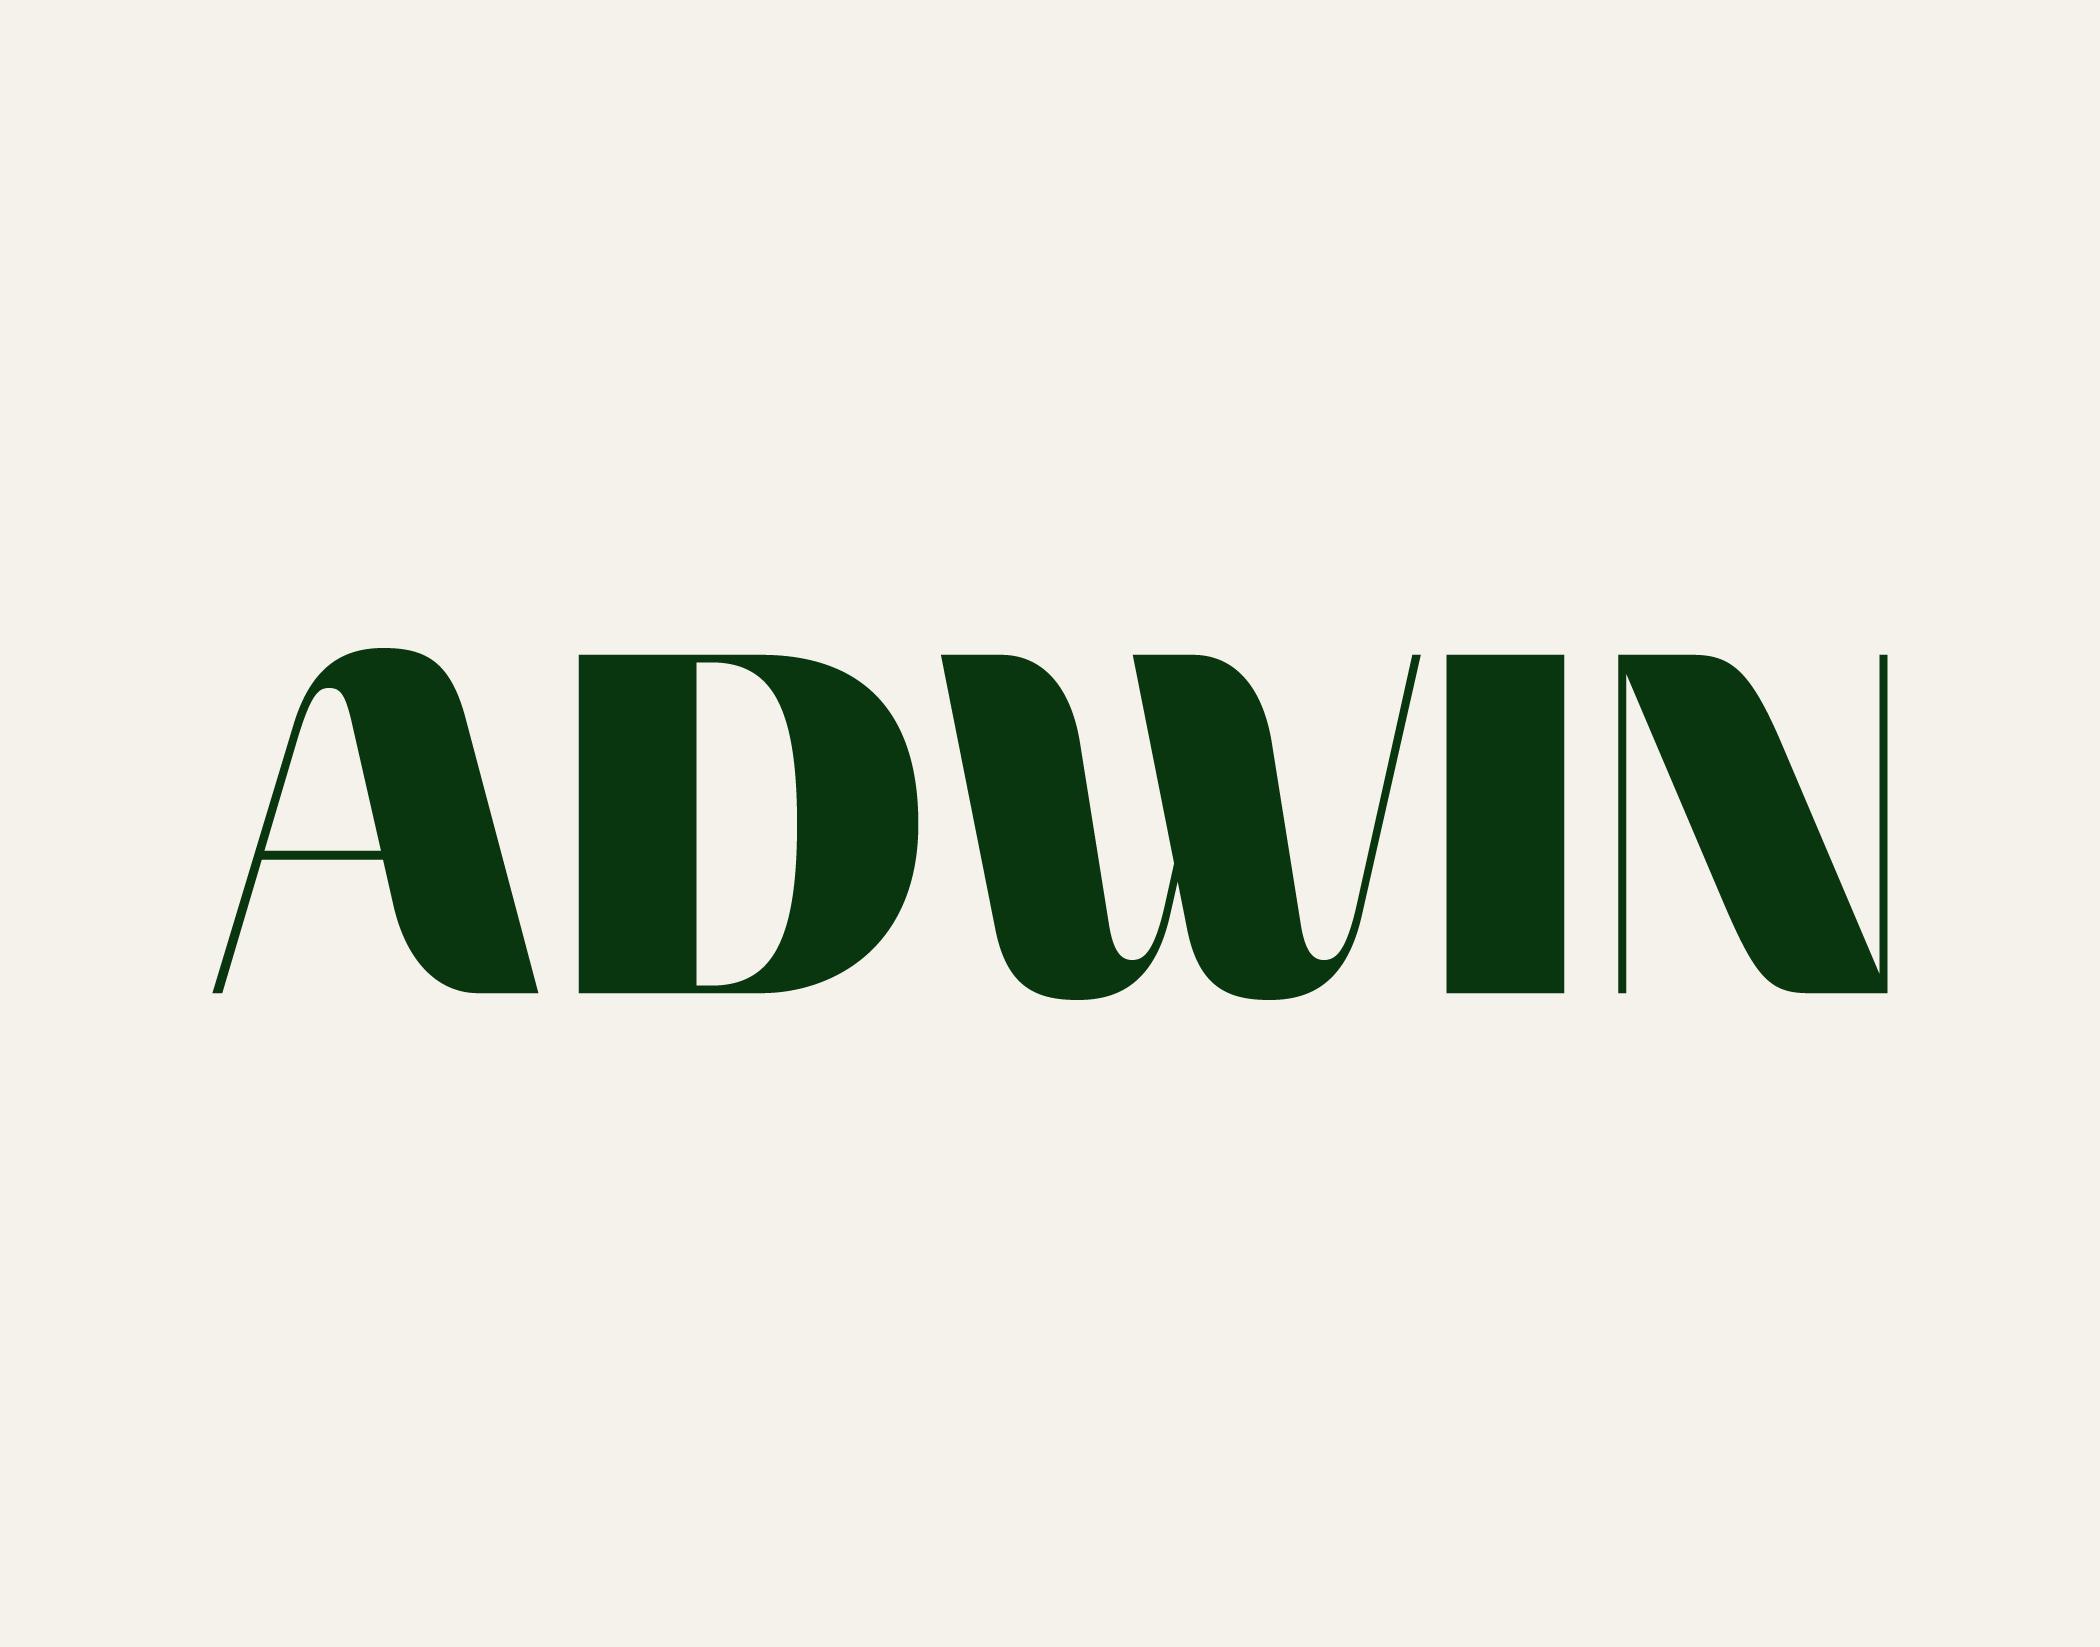 Adwin1-1